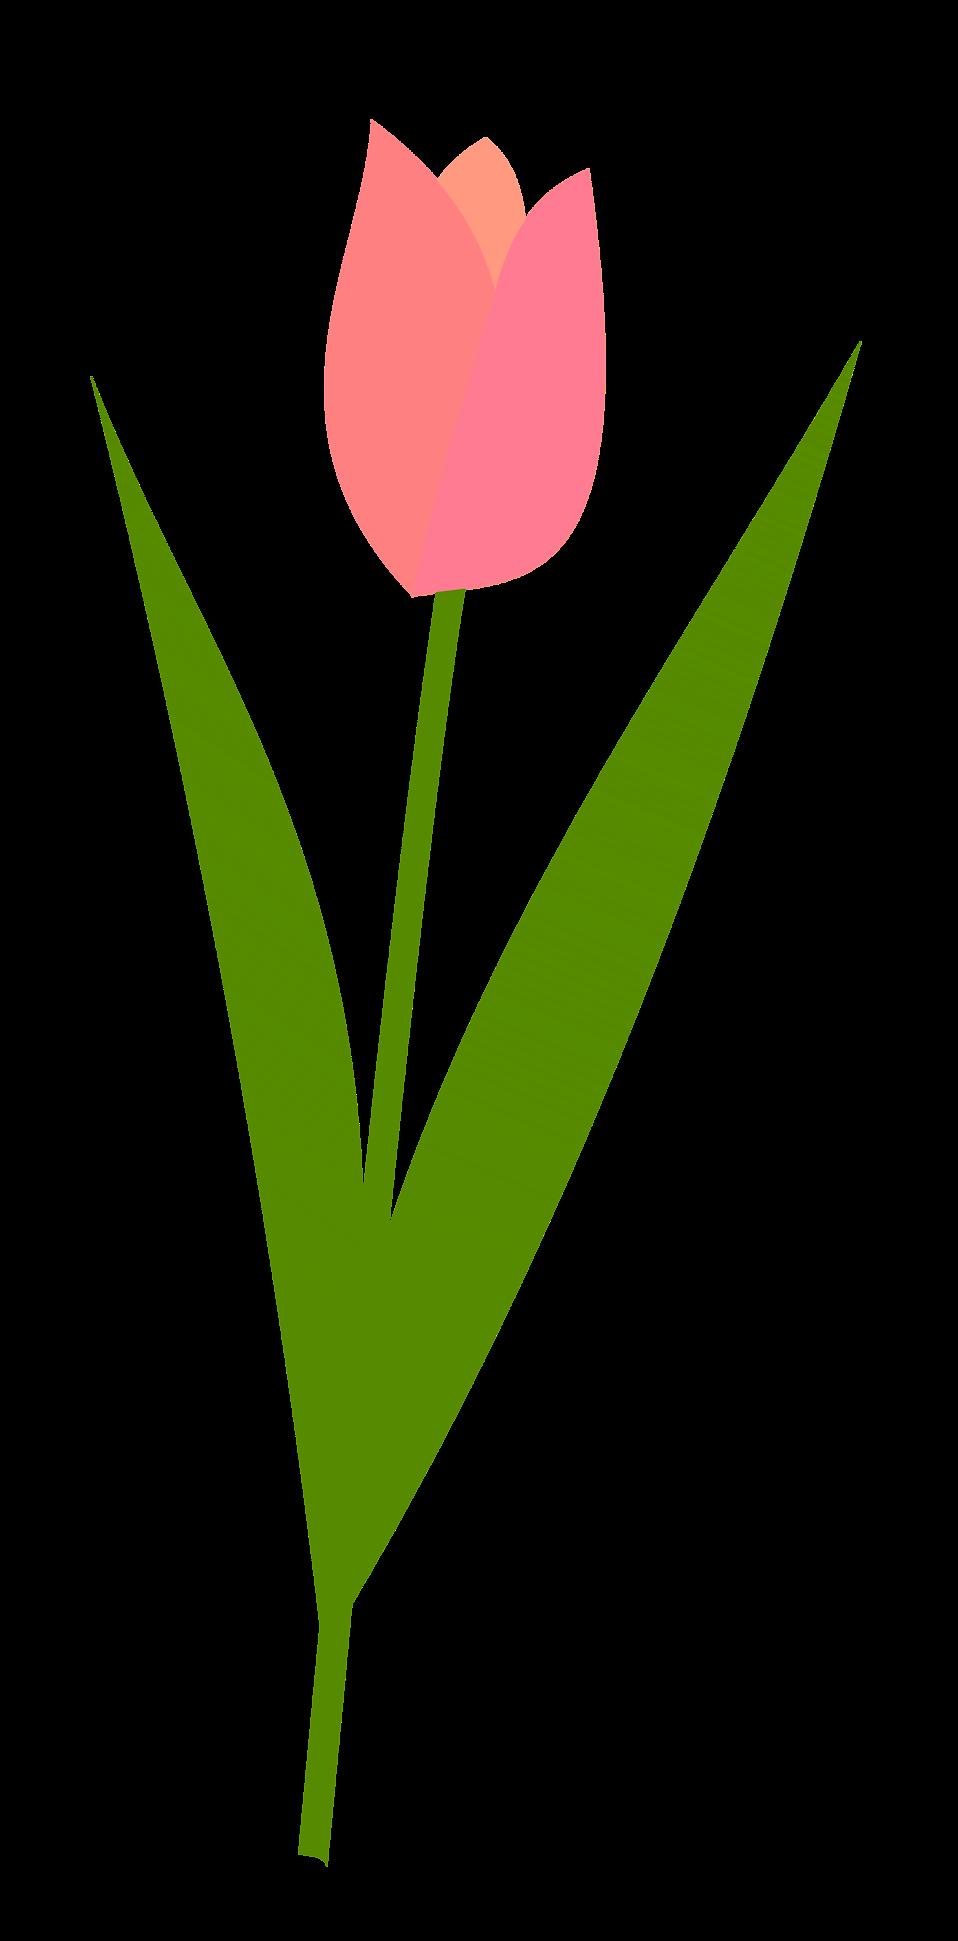 free clipart tulip flower - photo #25